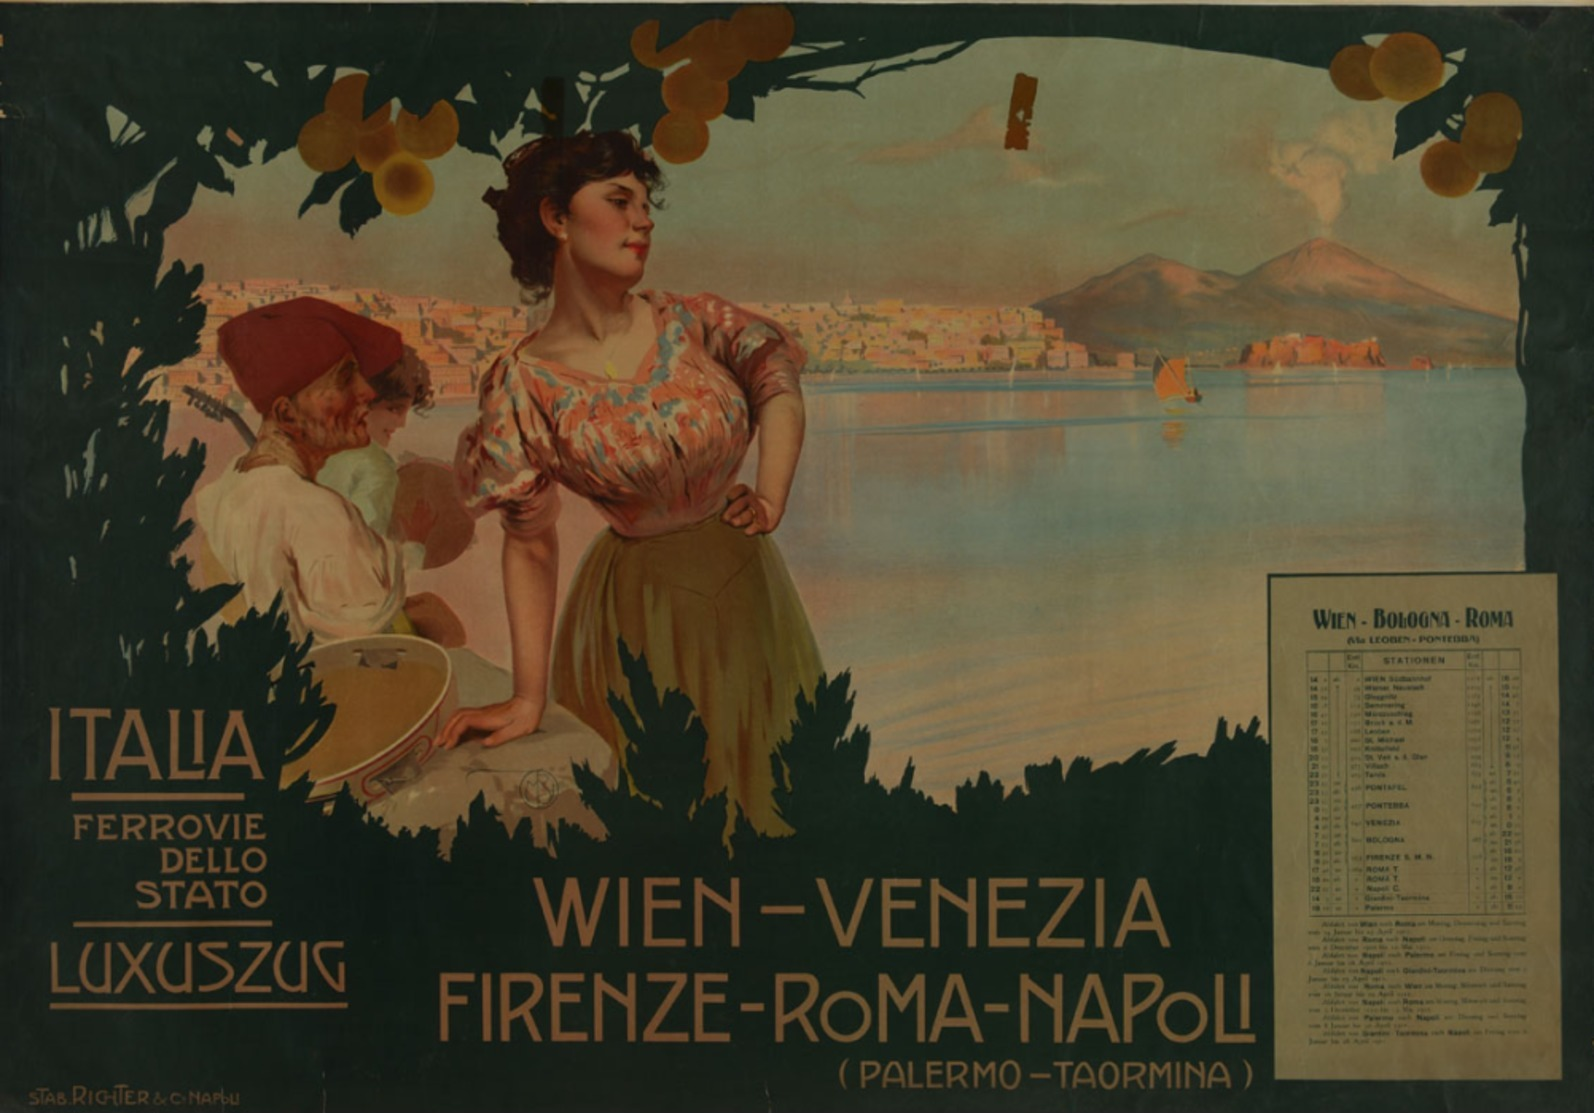 Railway Postcard Italia FS Wien-Venezia-Firenze-Roma-Napoli 1911 - Reproduction - Advertising